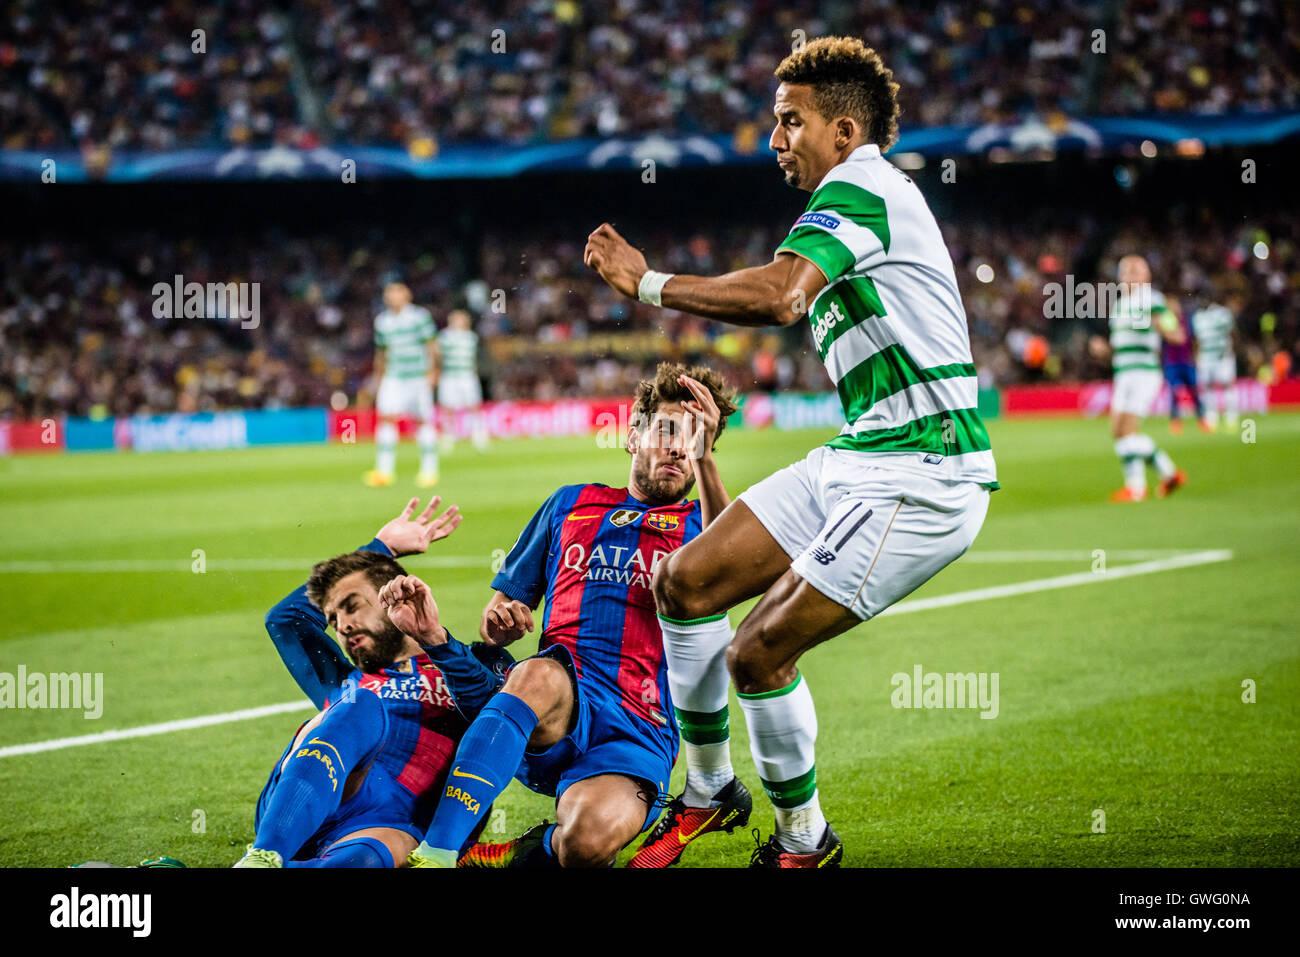 Barcelona, Catalonia, Spain. 13th Sep, 2016. Celtic midfielder SCOTT SINCLAIR in action against FC Barcelona defender - Stock Image